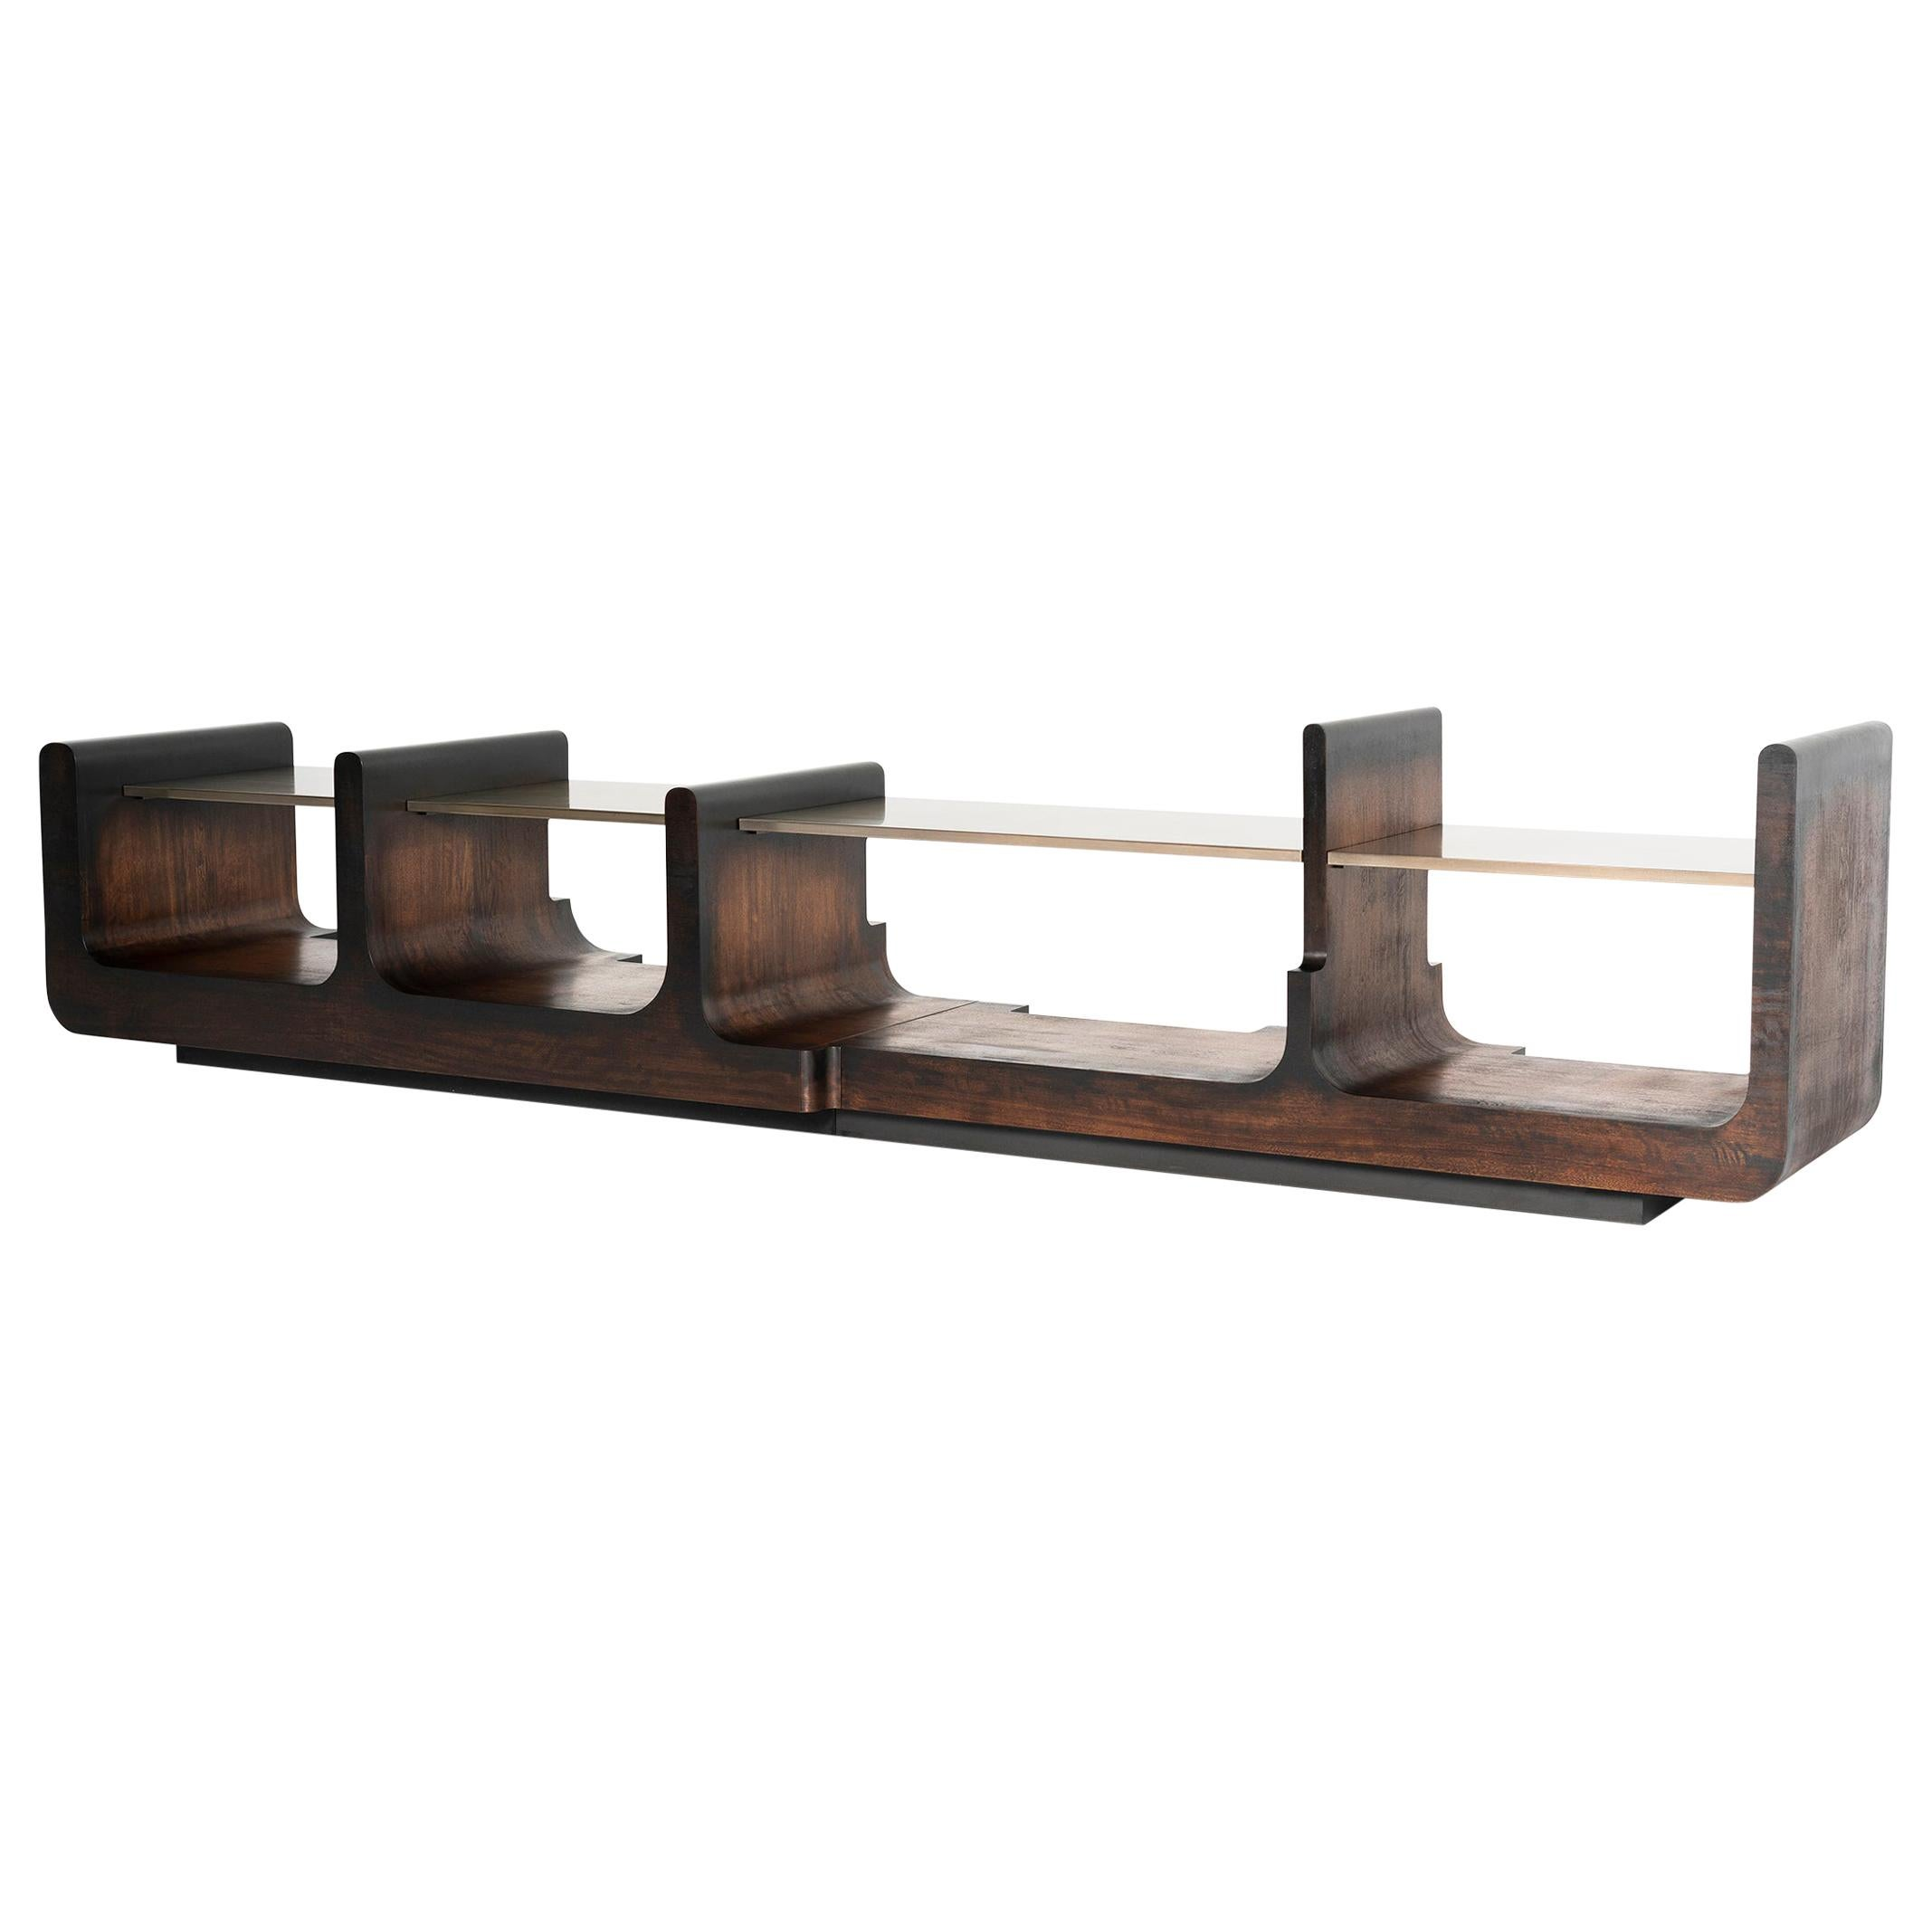 NOAH, 21st Century Modern Bespoke Audio Sideboard in African Walnut and Brass